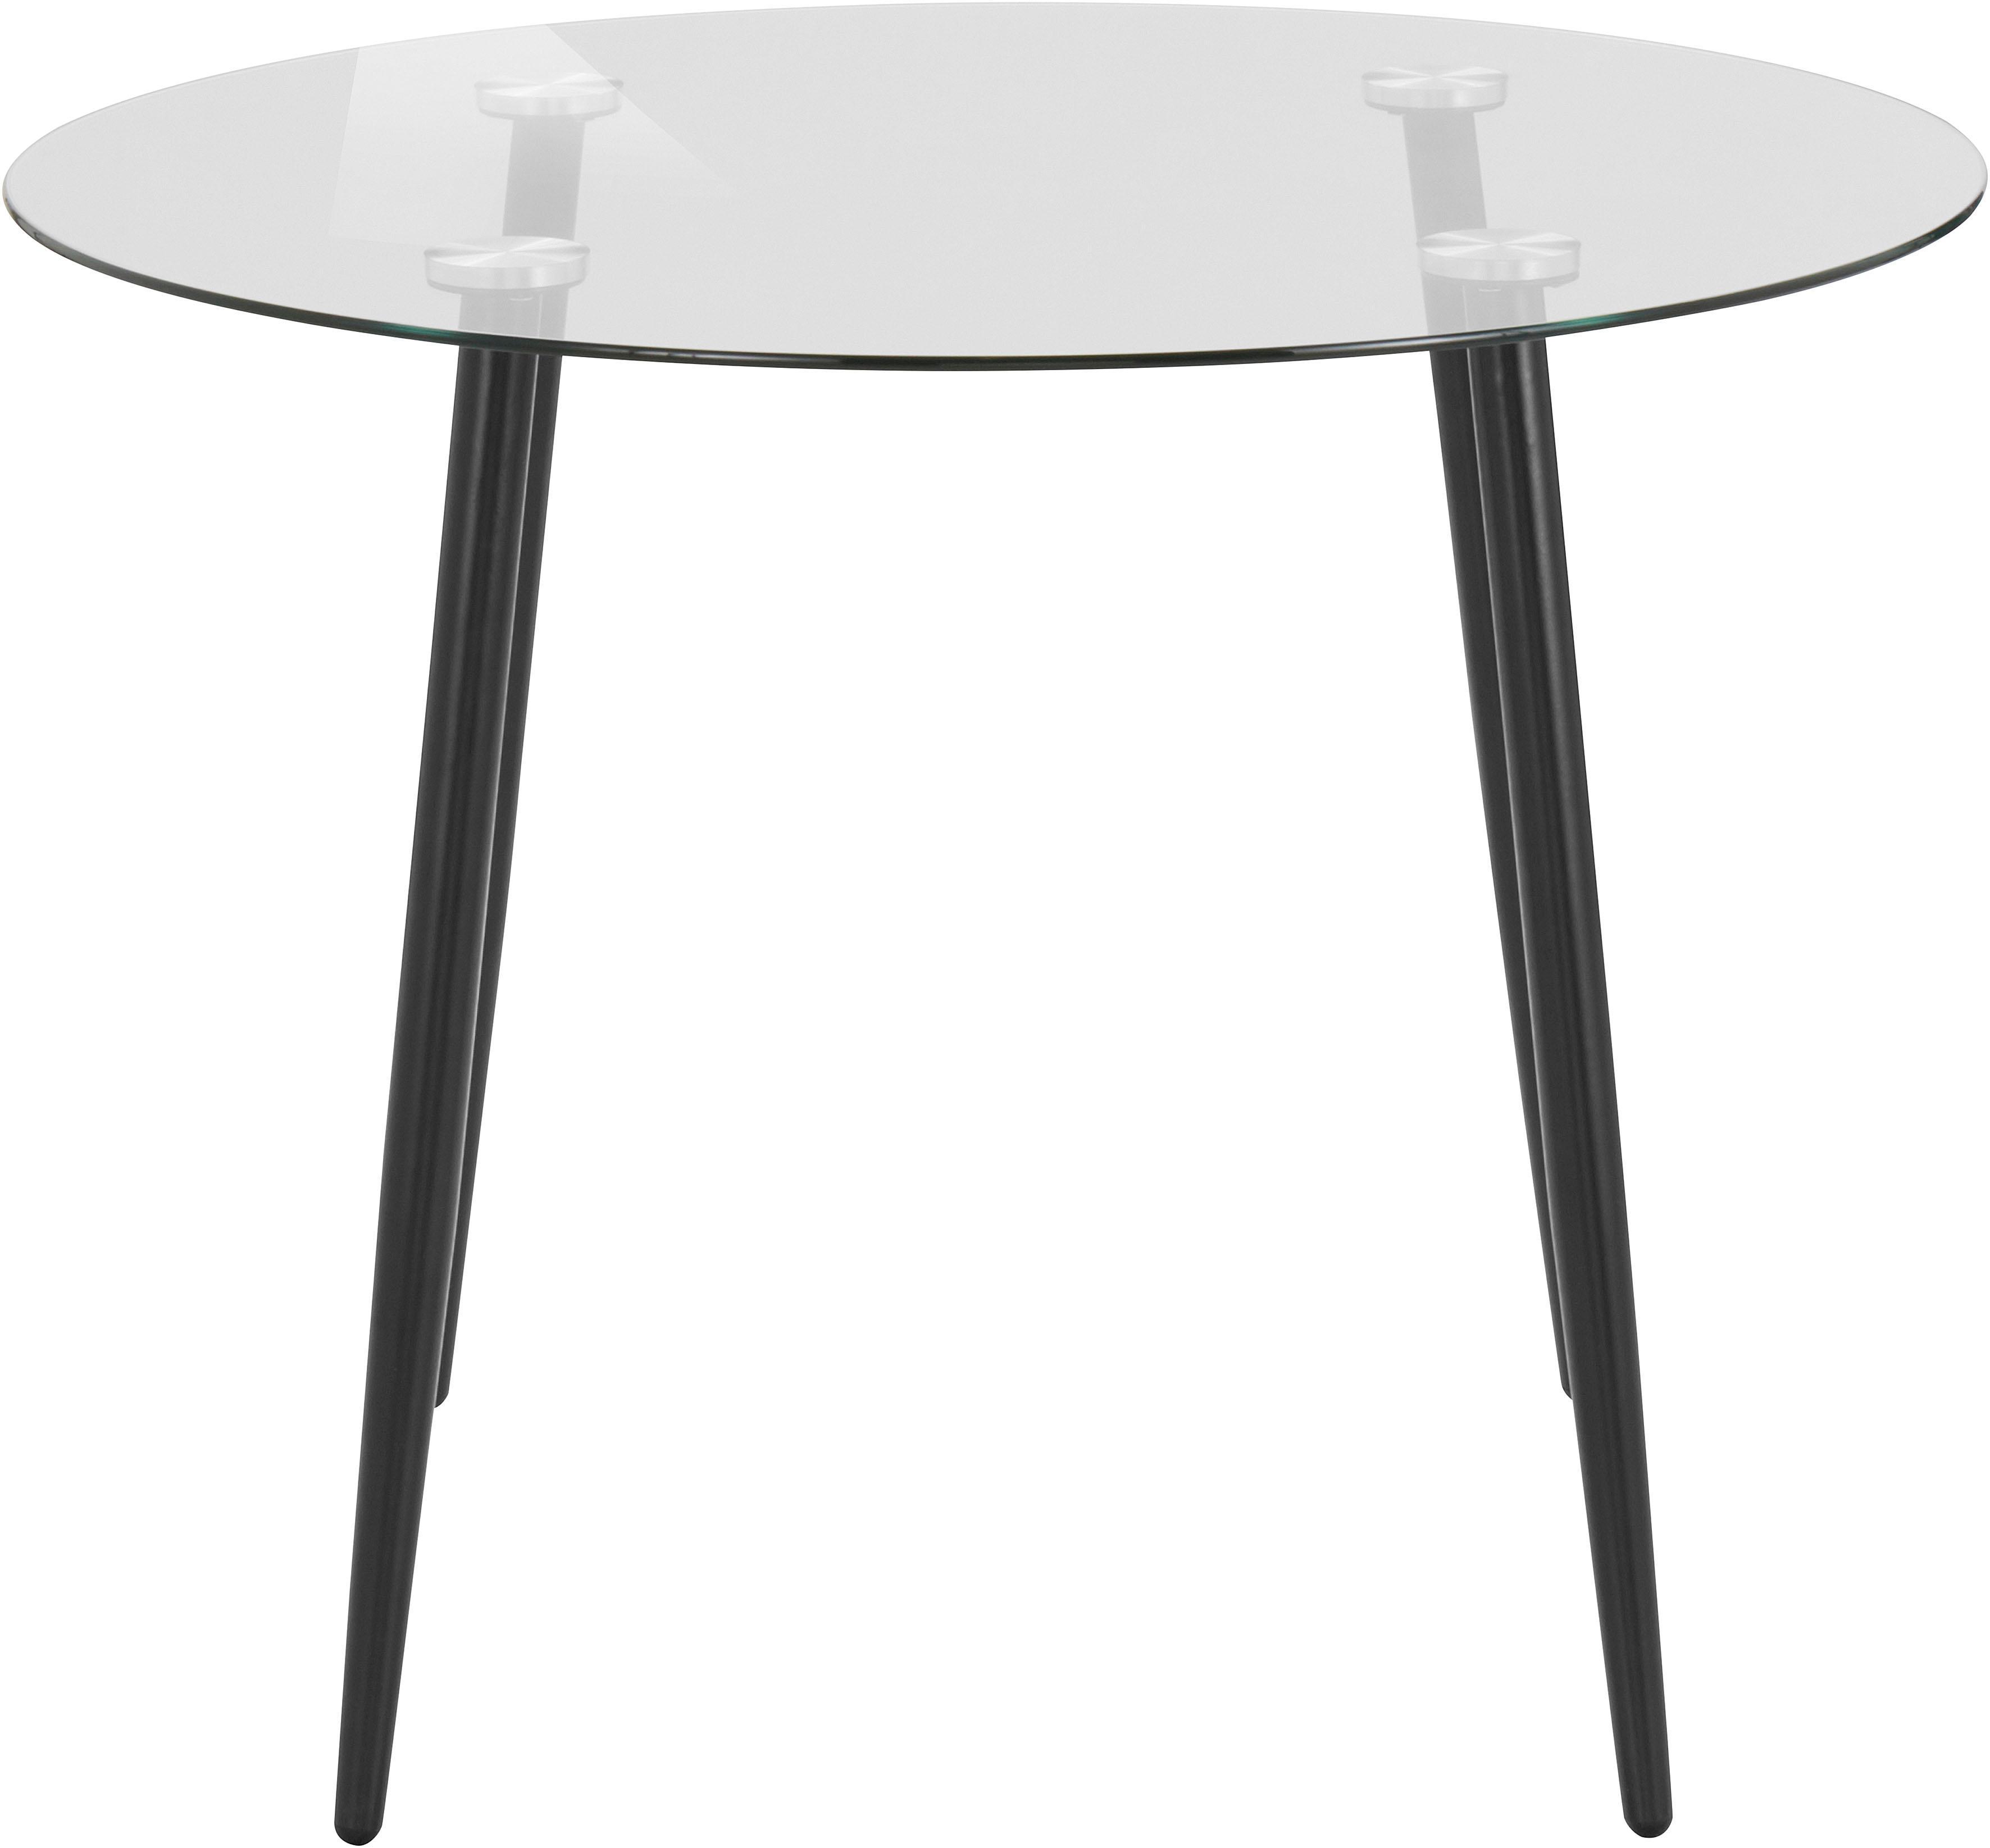 esstisch danny rund breite 100 cm task jugendhilfe. Black Bedroom Furniture Sets. Home Design Ideas